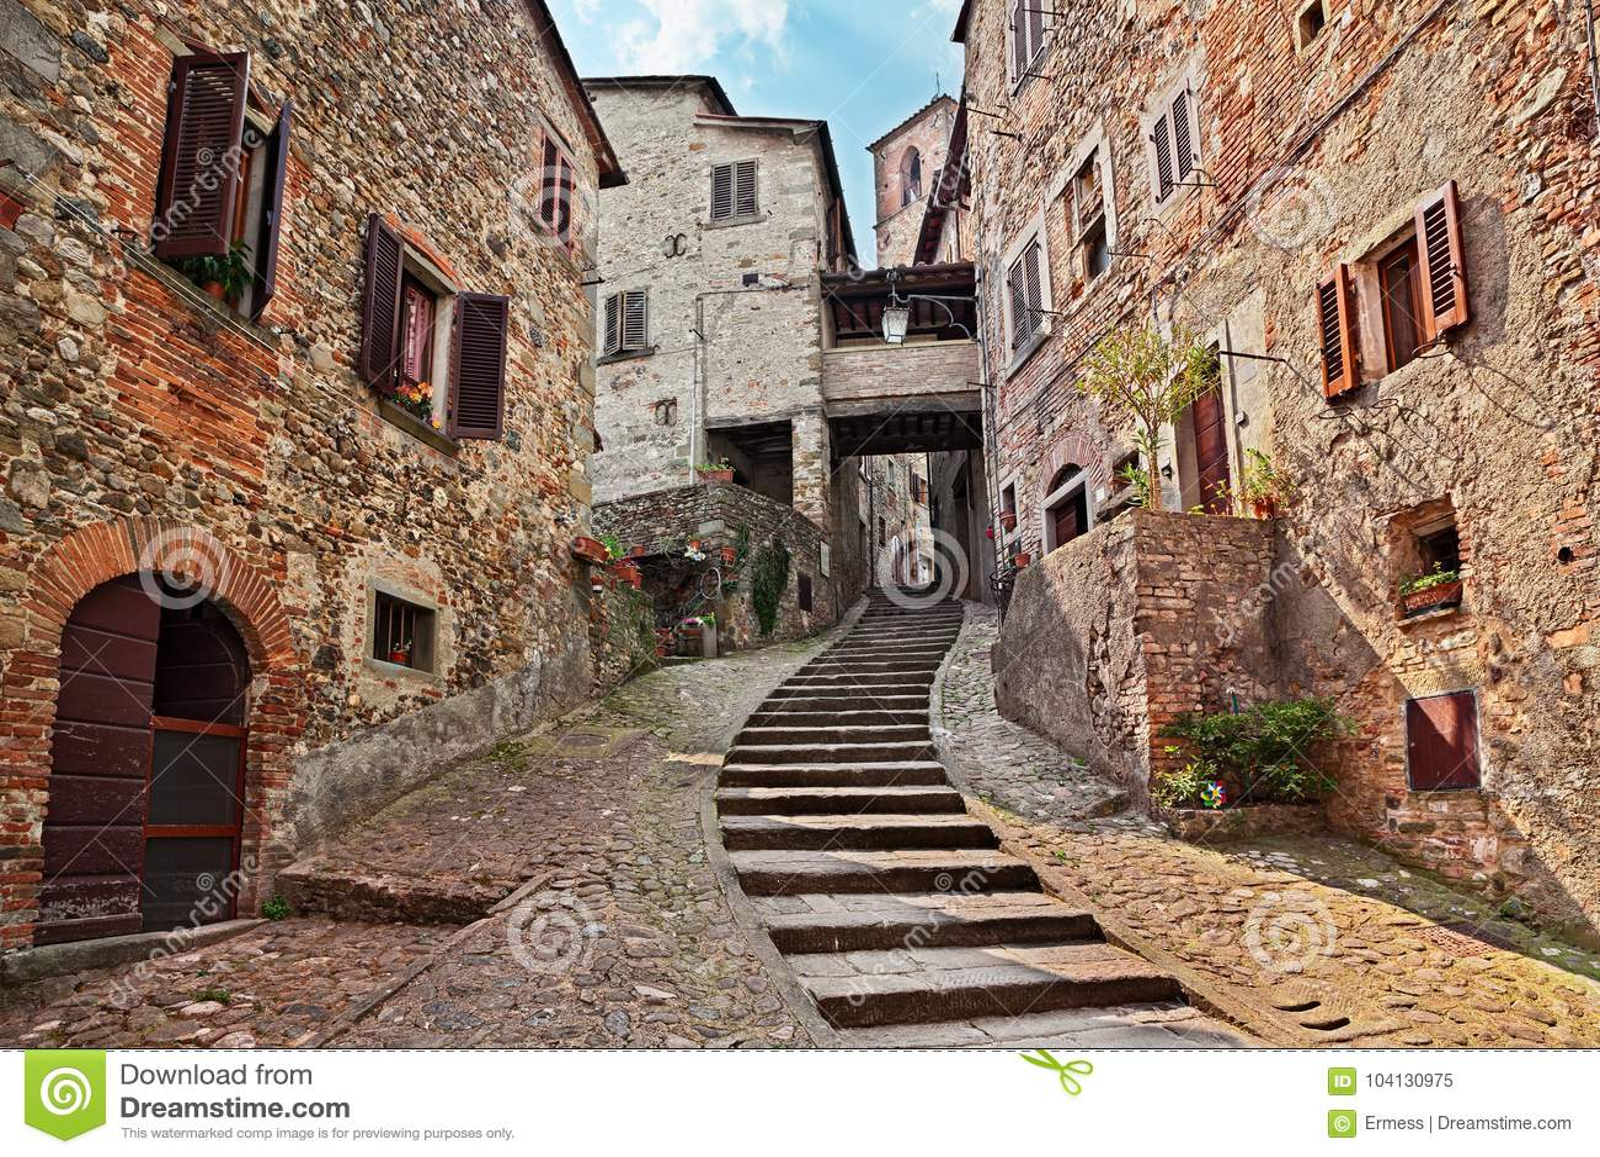 Anghiari Italy Map.Anghiari Arezzo Tuscany Italy Old Alley In The Medieval Village